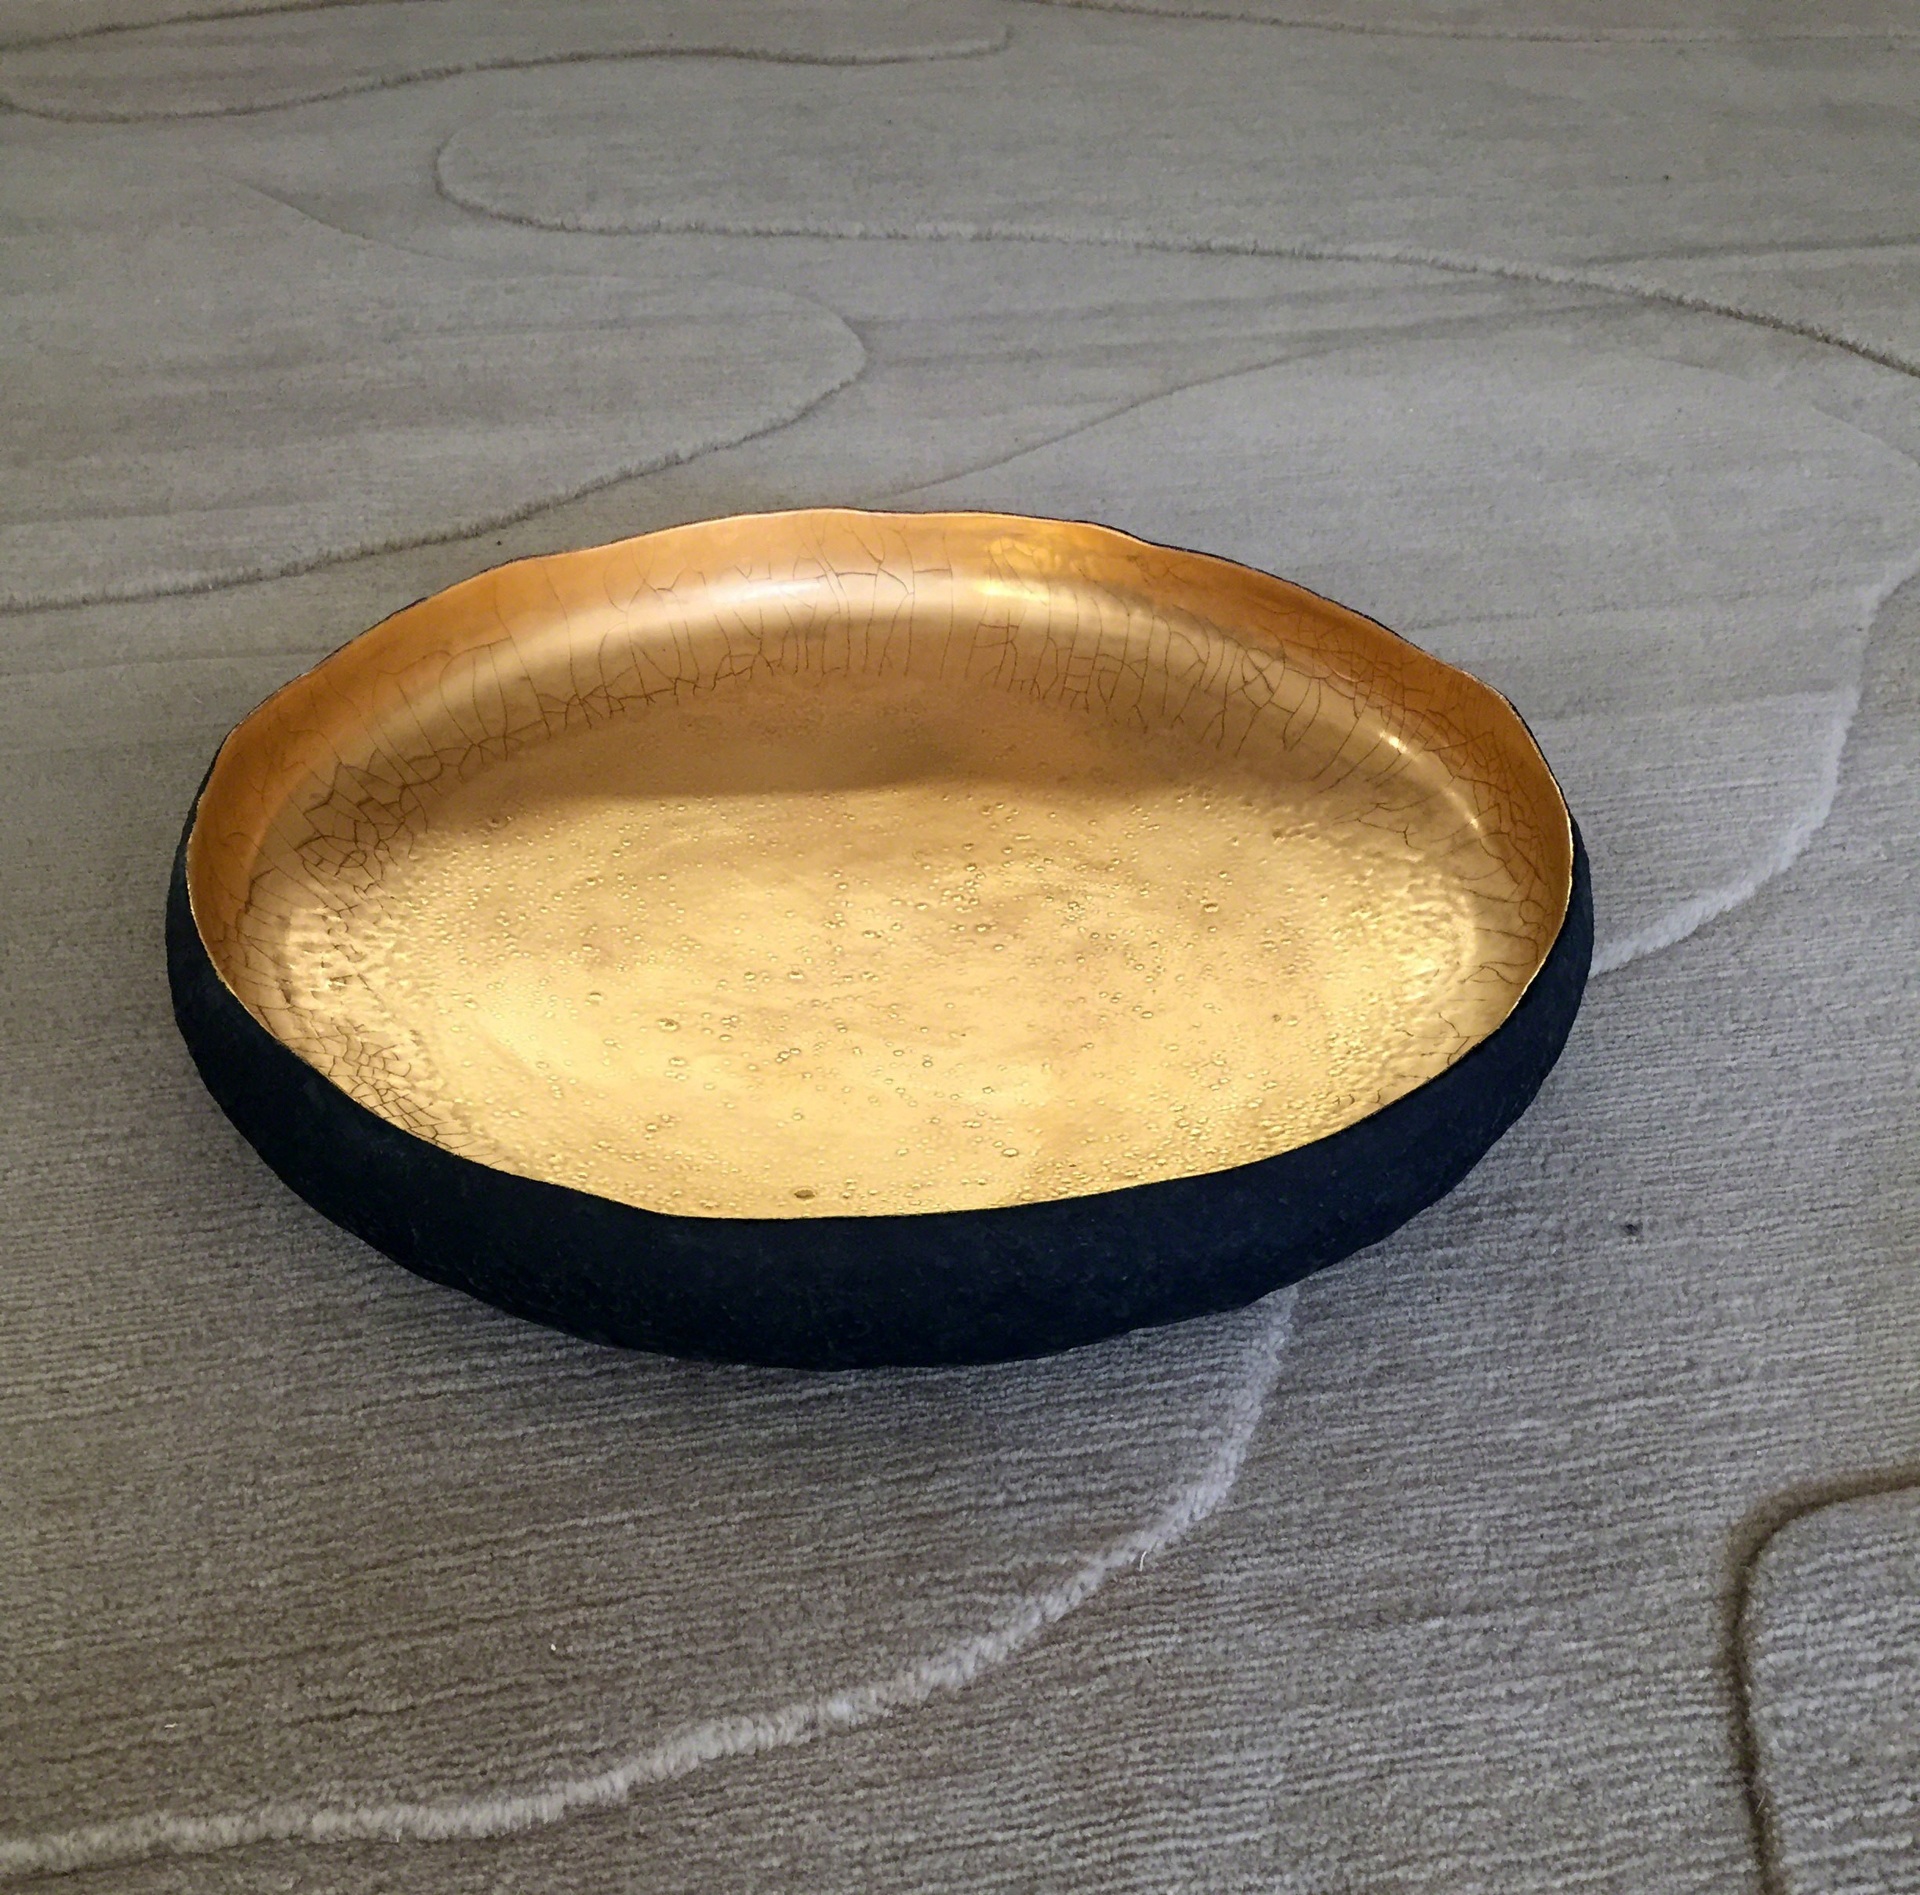 Round centerpiece with 22k gold  by Cristina Salusti